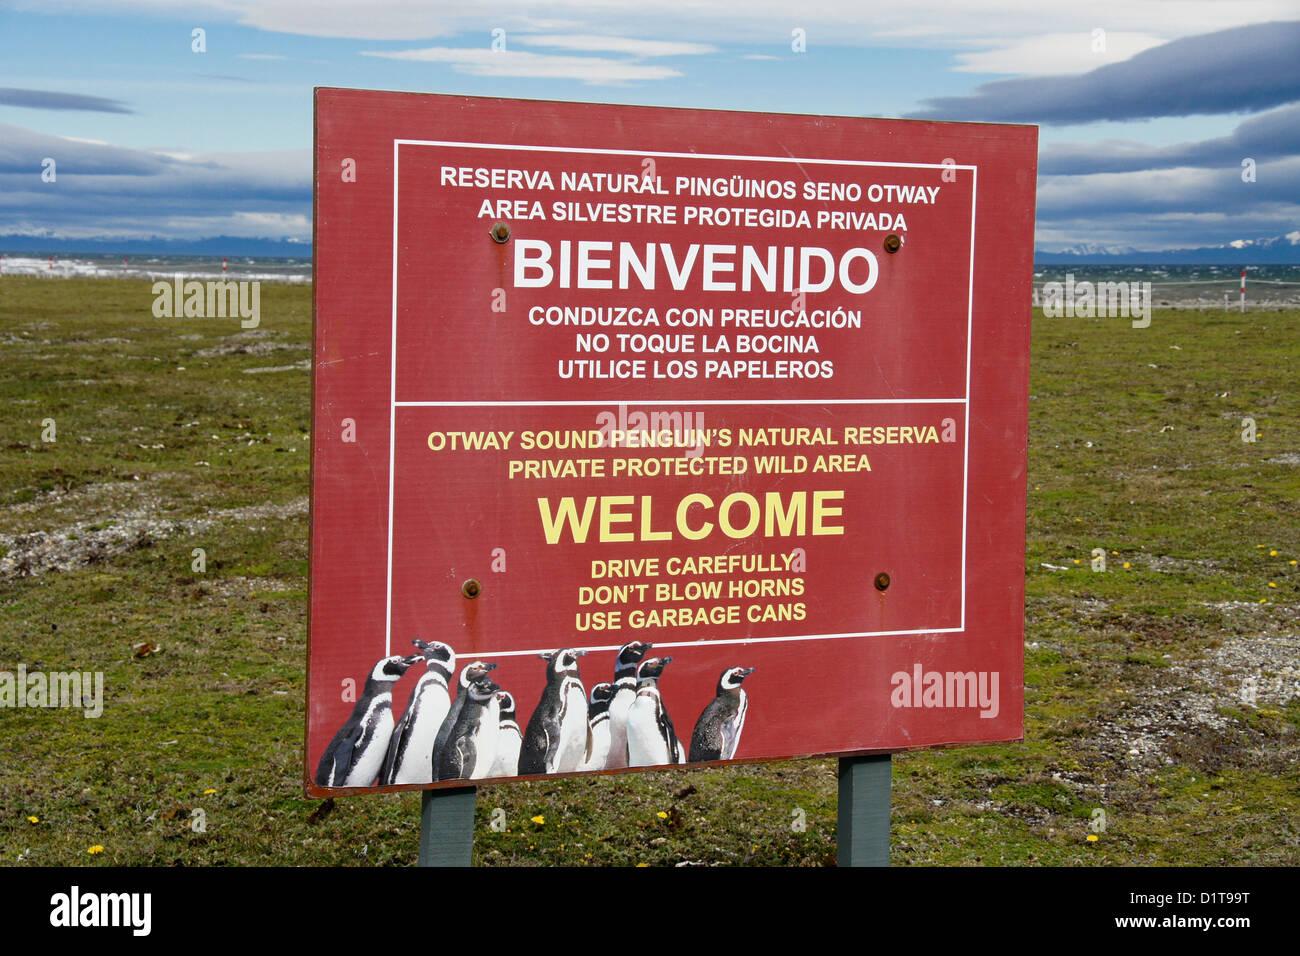 Firmar al Seno Otway Reserva Pingüino, Patagonia, Chile Imagen De Stock